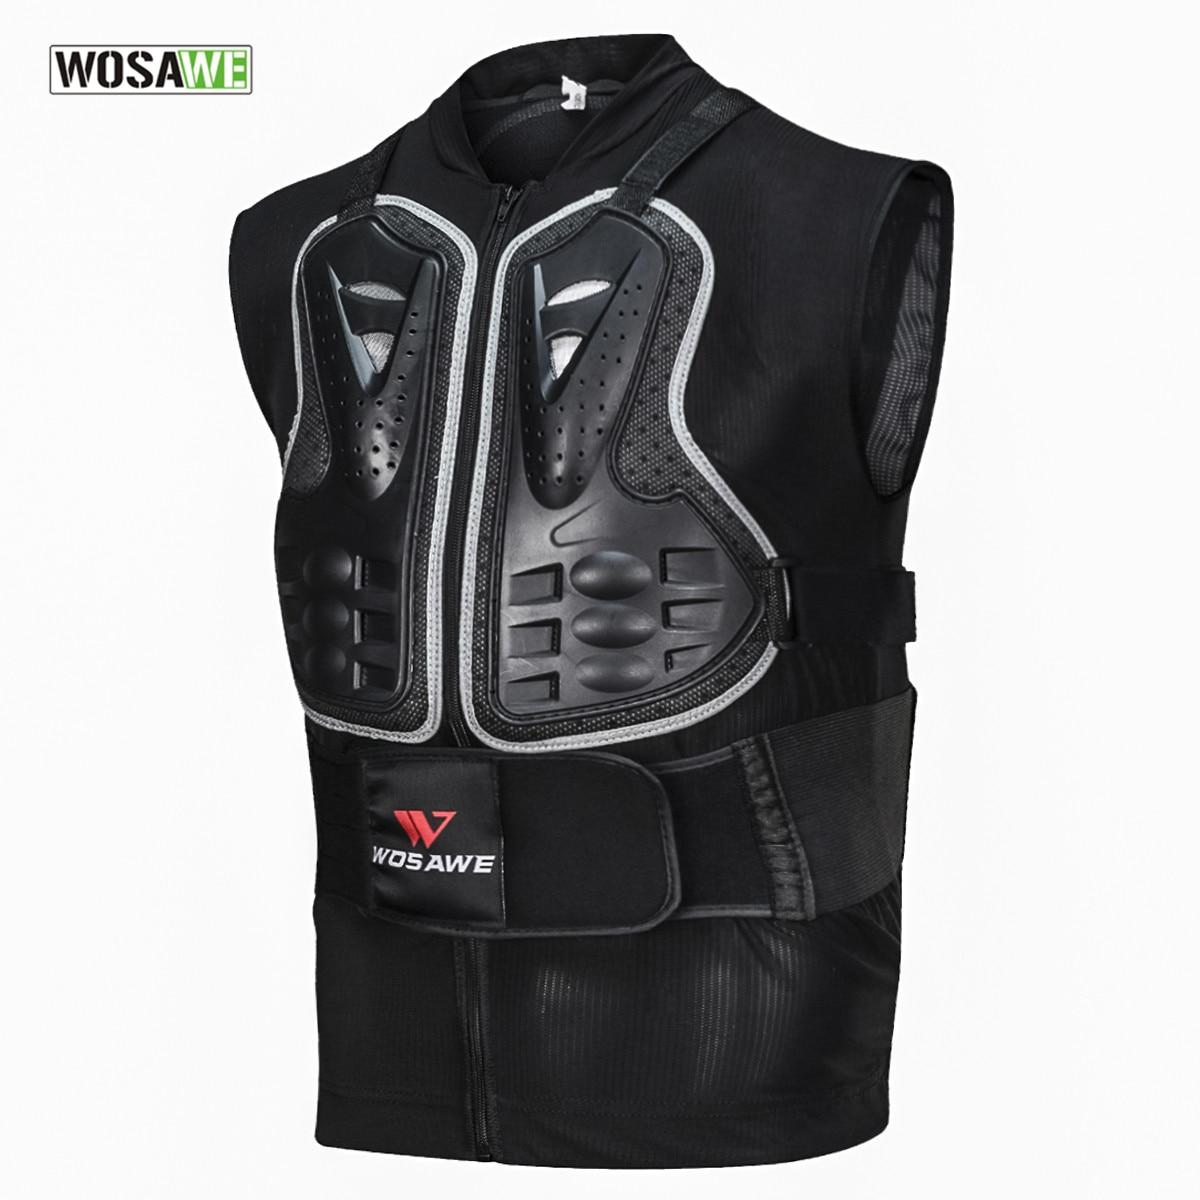 WOSAWE gilet armure moto Motocross tout-terrain course poitrine protecteur cyclisme Ski corps protection patinage snowboard vestes